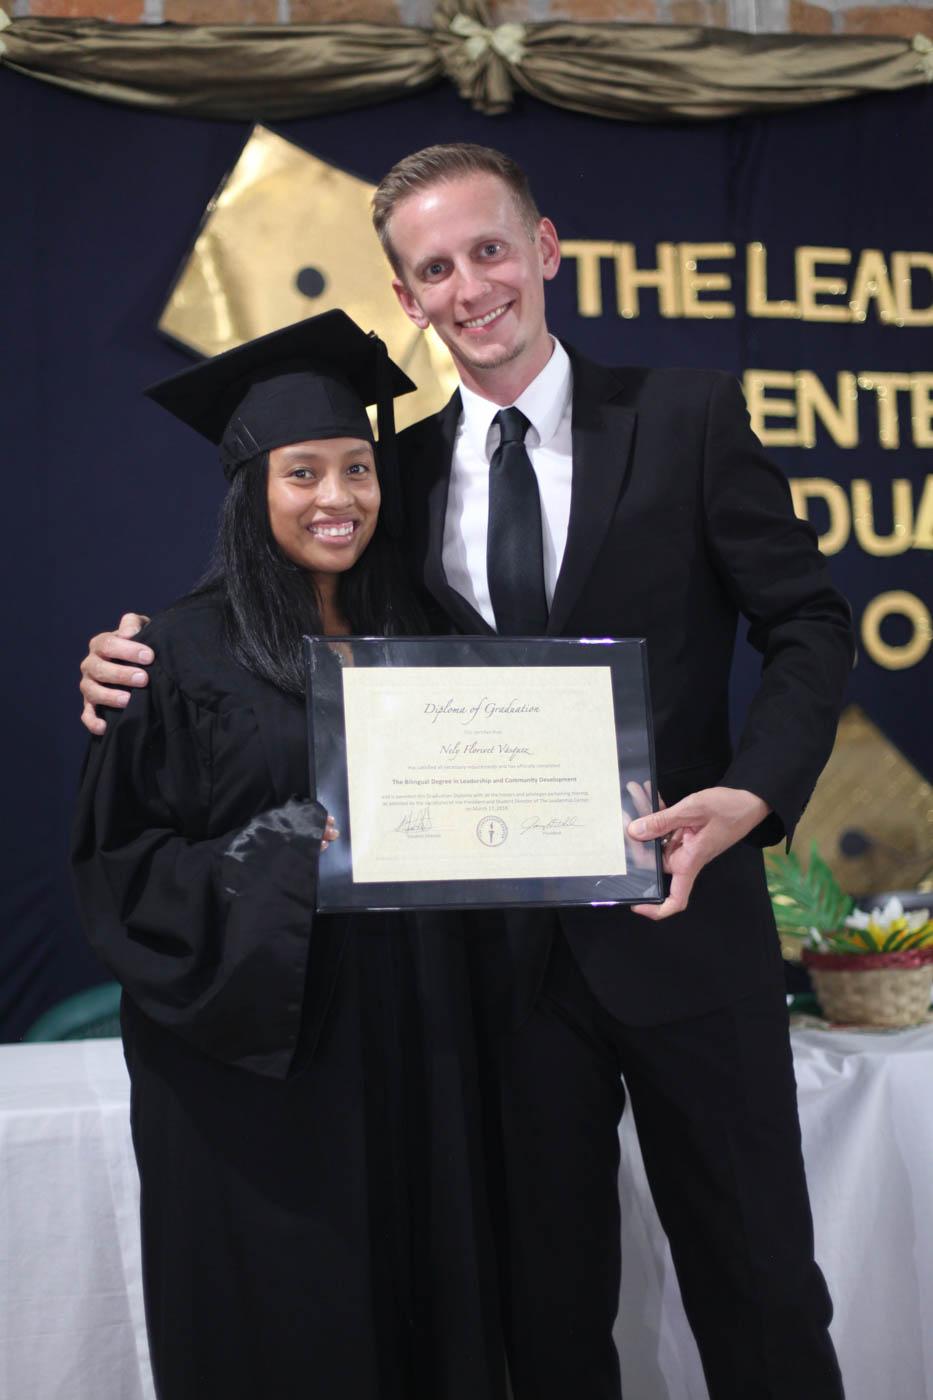 Cohort 6 Grad - Nely with TLC President, Joseph Rahm